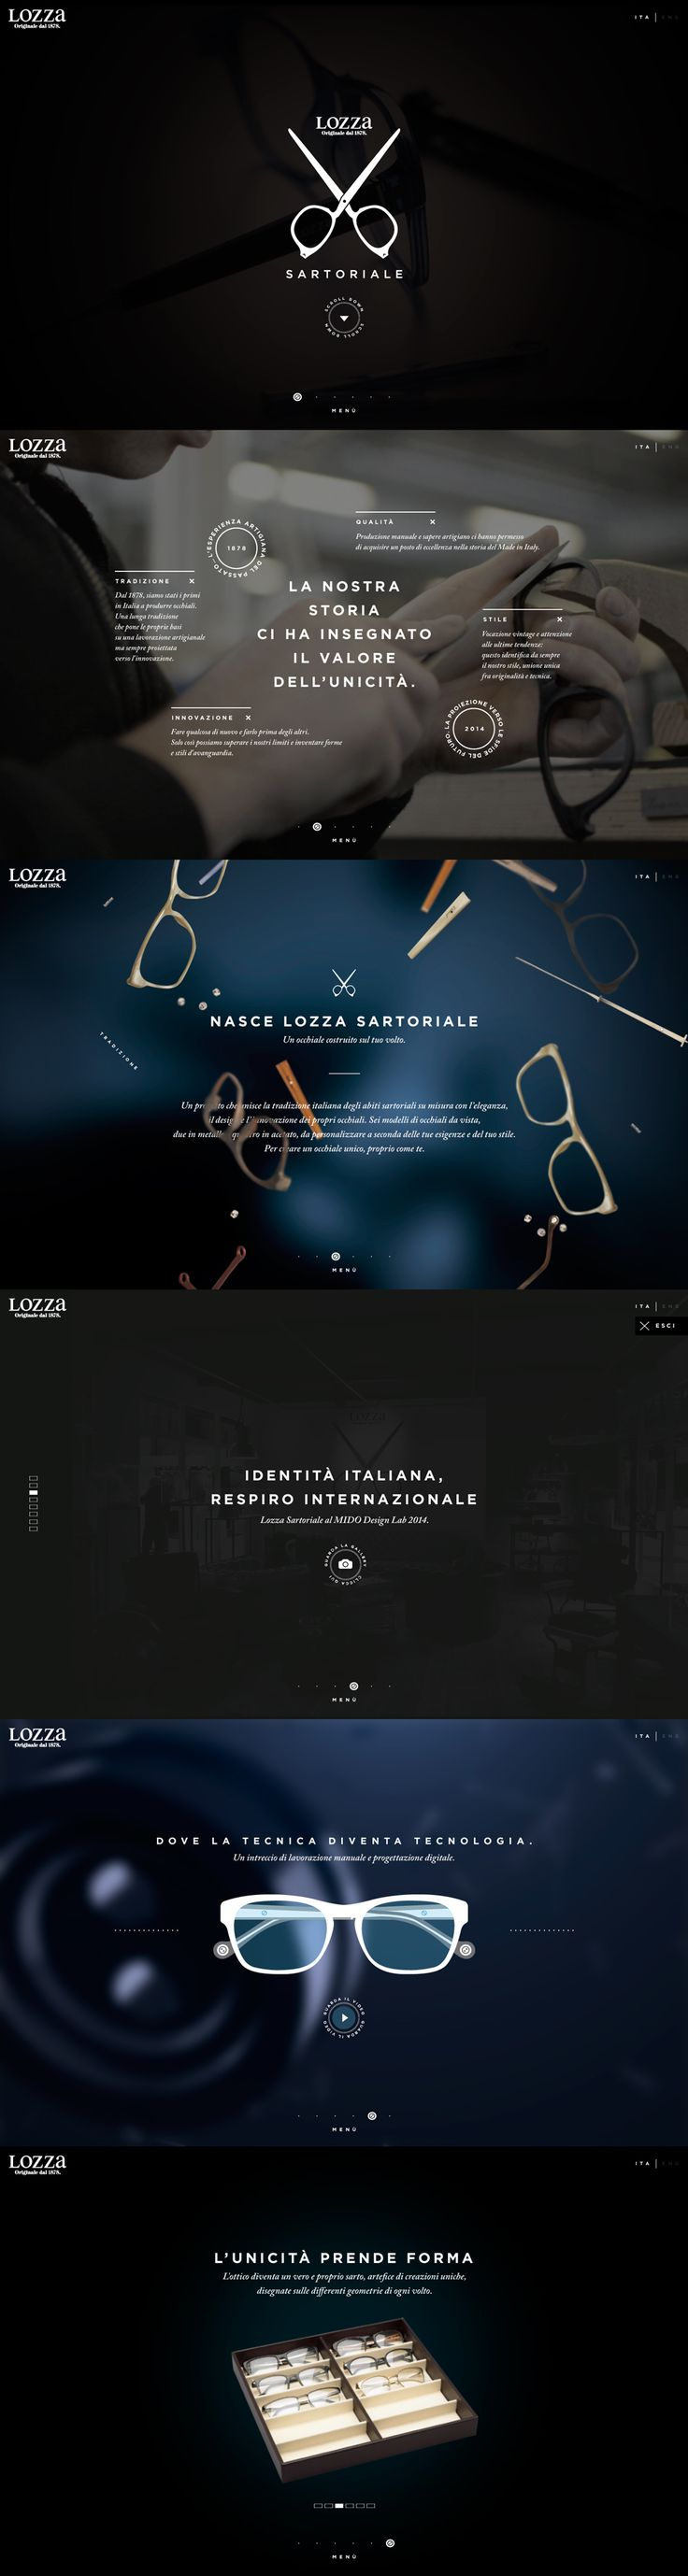 Lozza Sartoriale _ New website by Davide Scarpantonio &  Simone Galloni